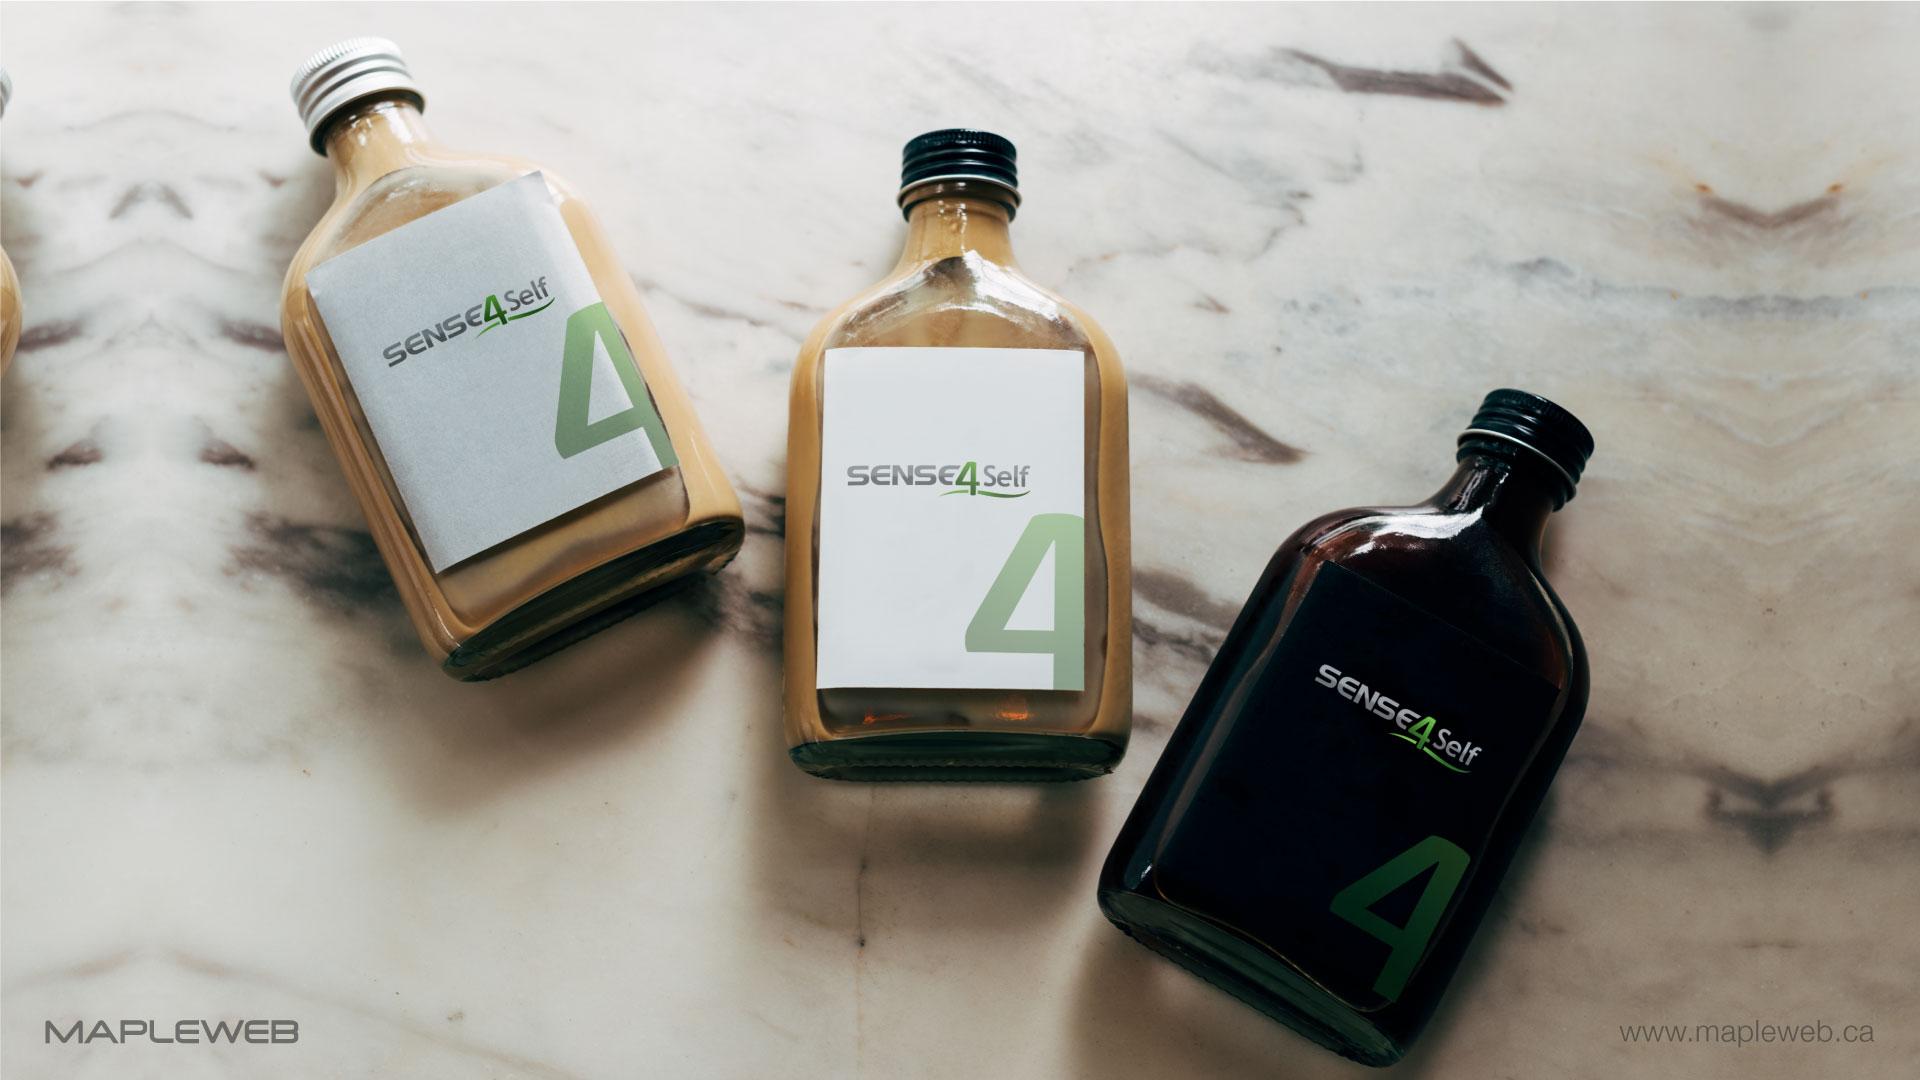 sense-4-self-brand-logo-design-by-mapleweb-vancouver-canada-organic-matcha-drink-mock